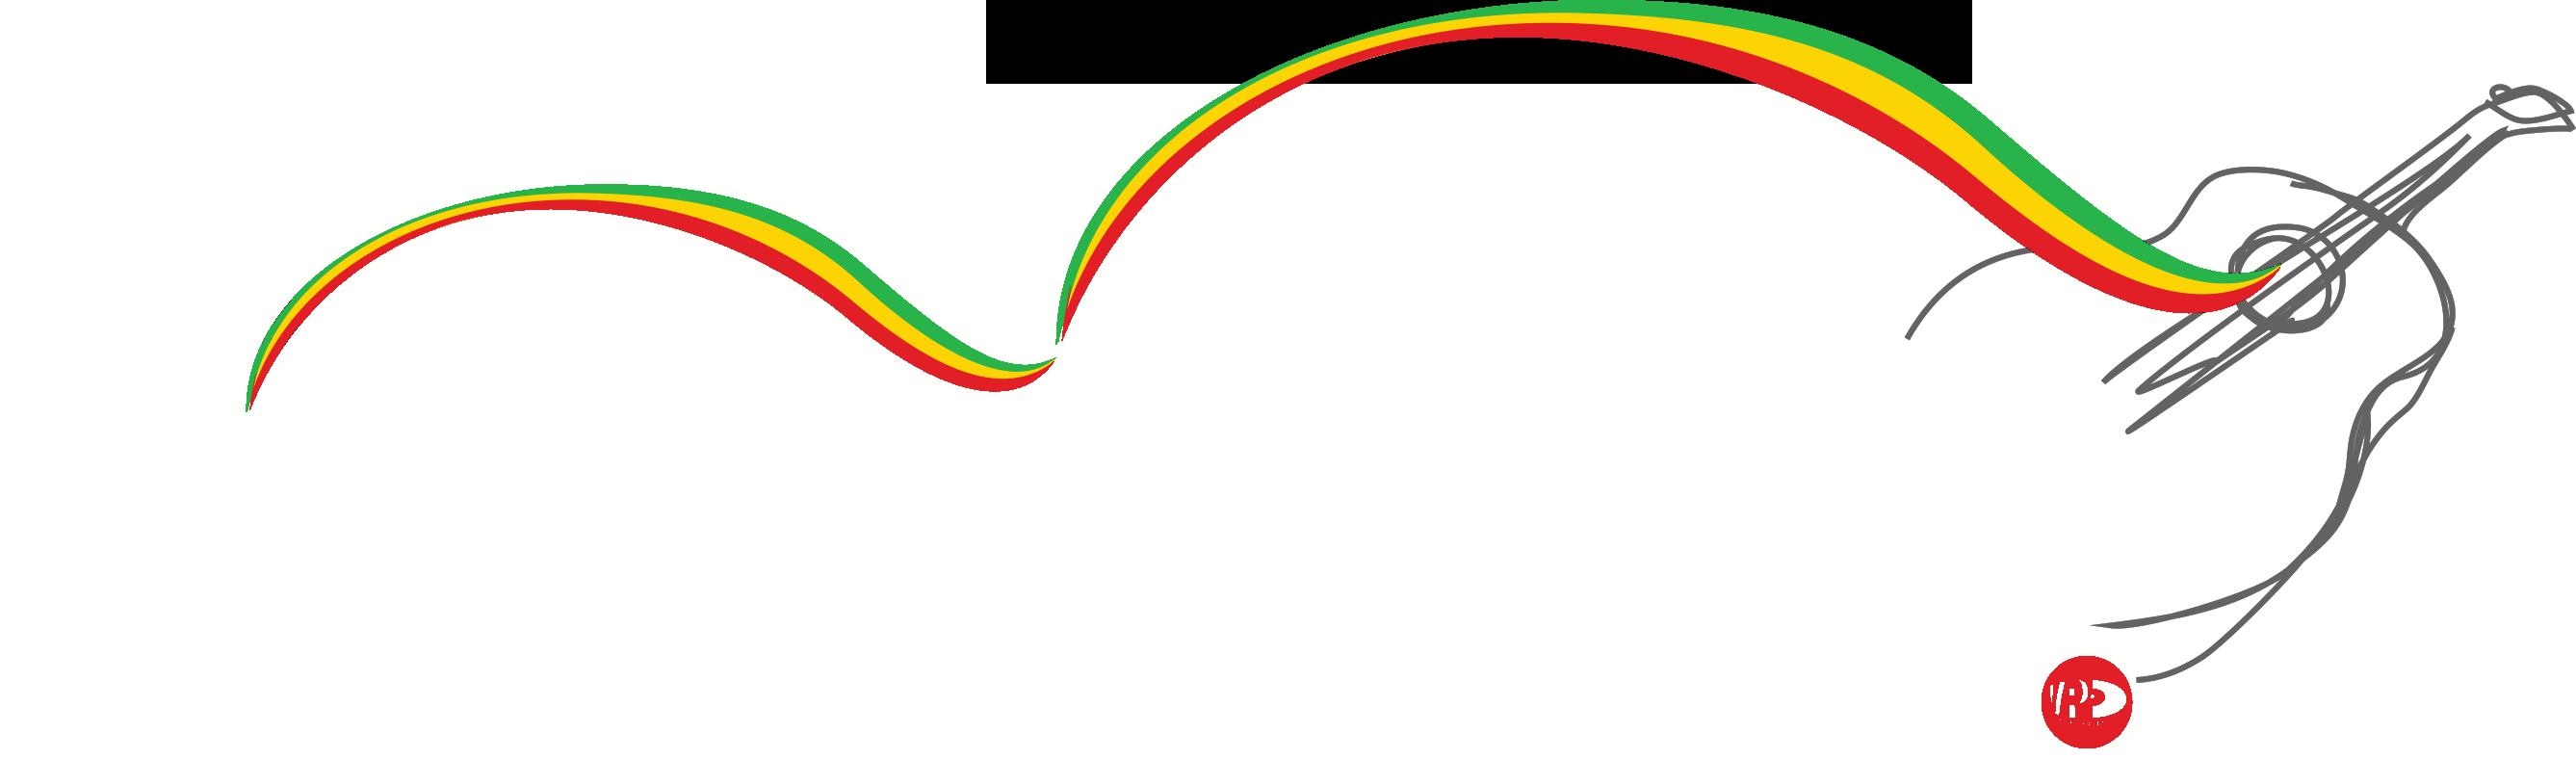 ARMJ_Finalcolor_logo_Horiz